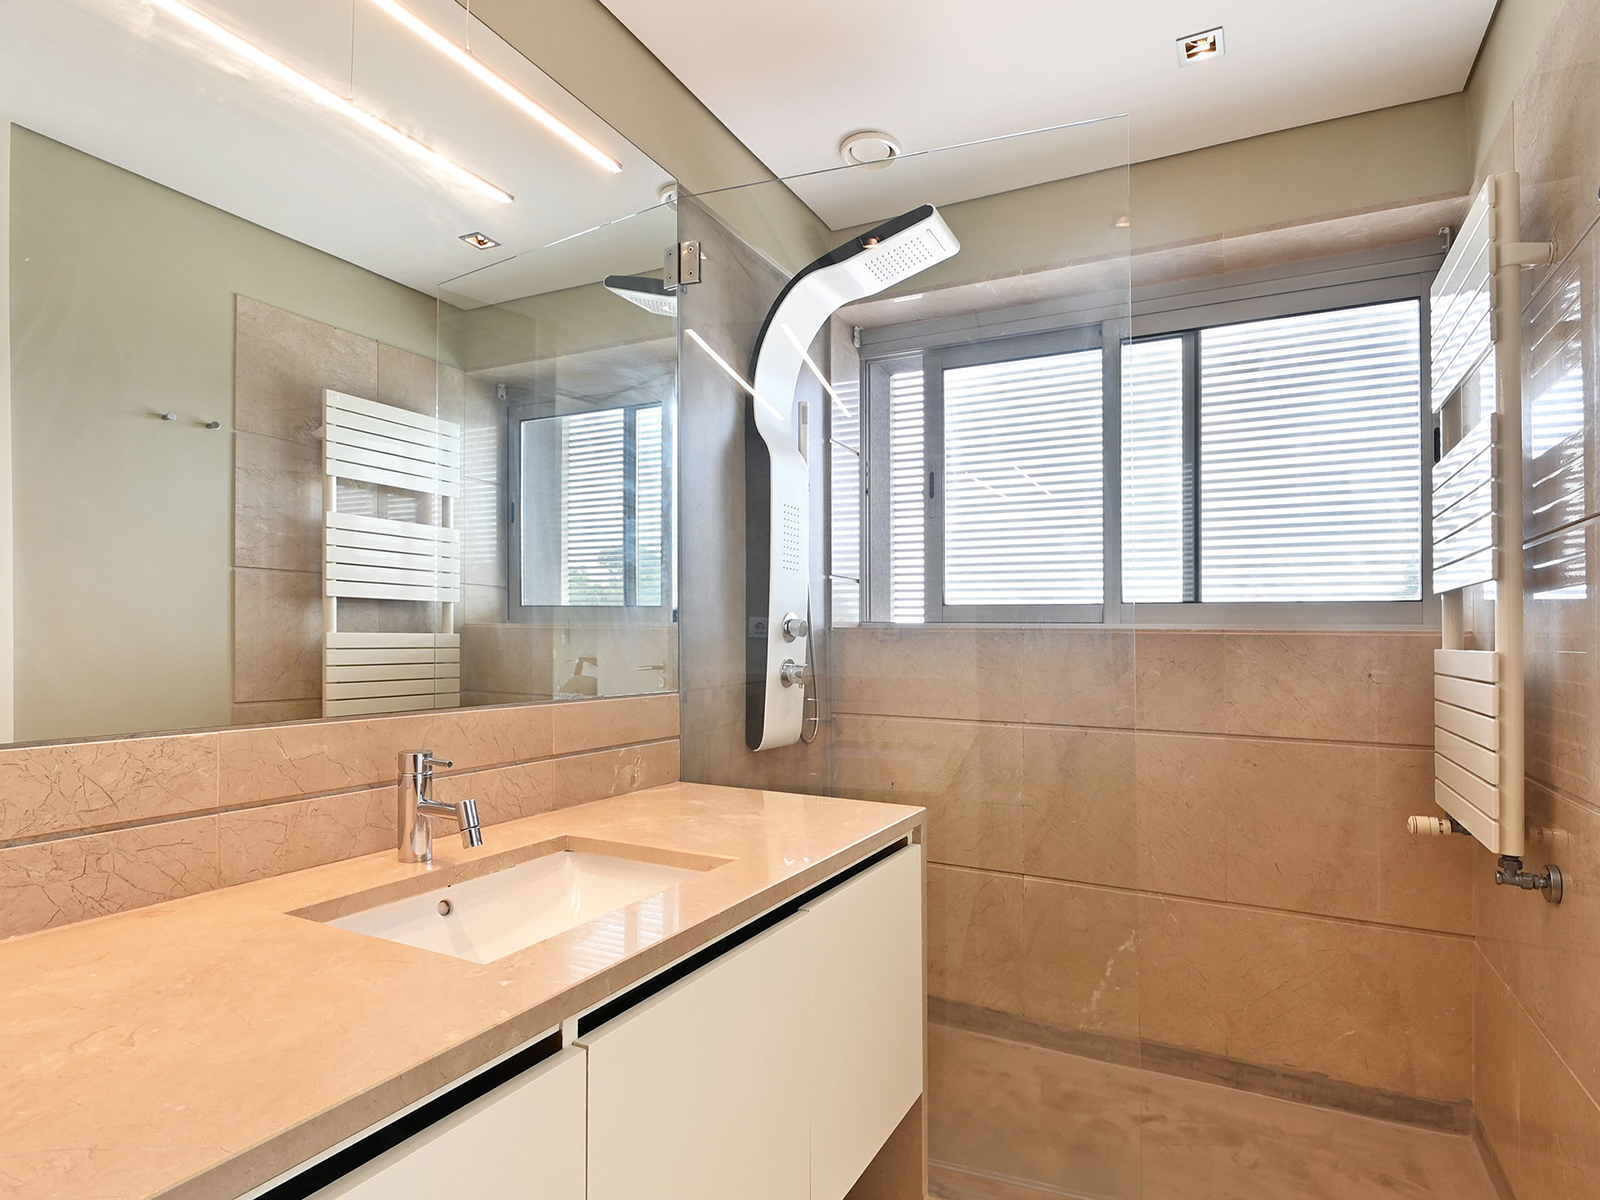 Used Apartment in Mafamude e Vilar do Paraíso – 185 m²